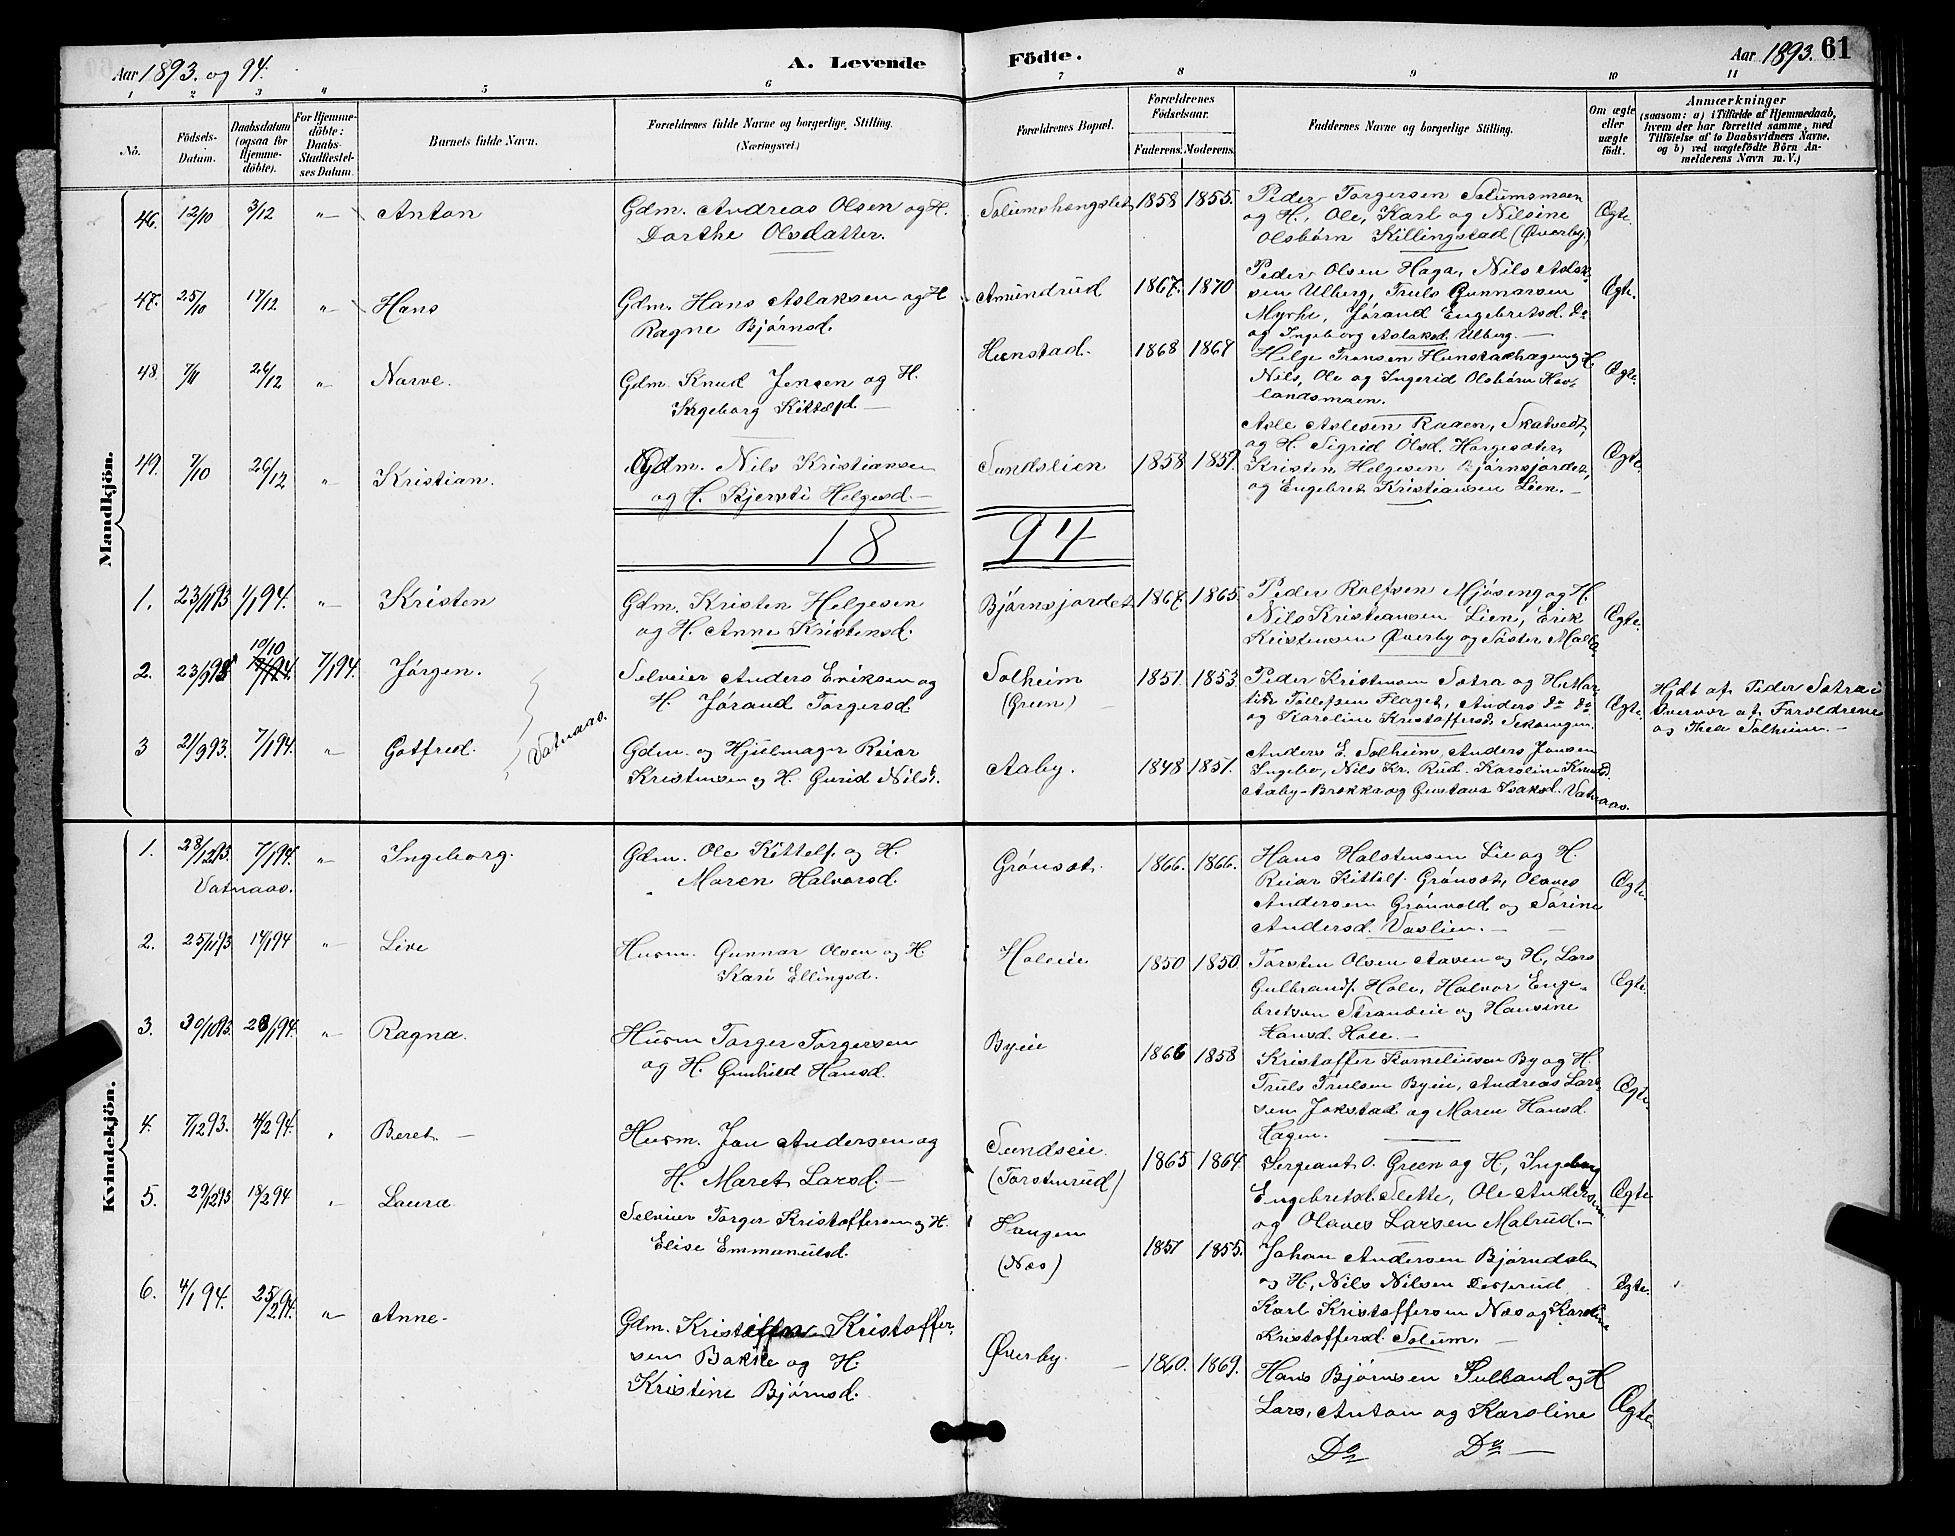 SAKO, Sigdal kirkebøker, G/Ga/L0005: Klokkerbok nr. I 5, 1886-1900, s. 61